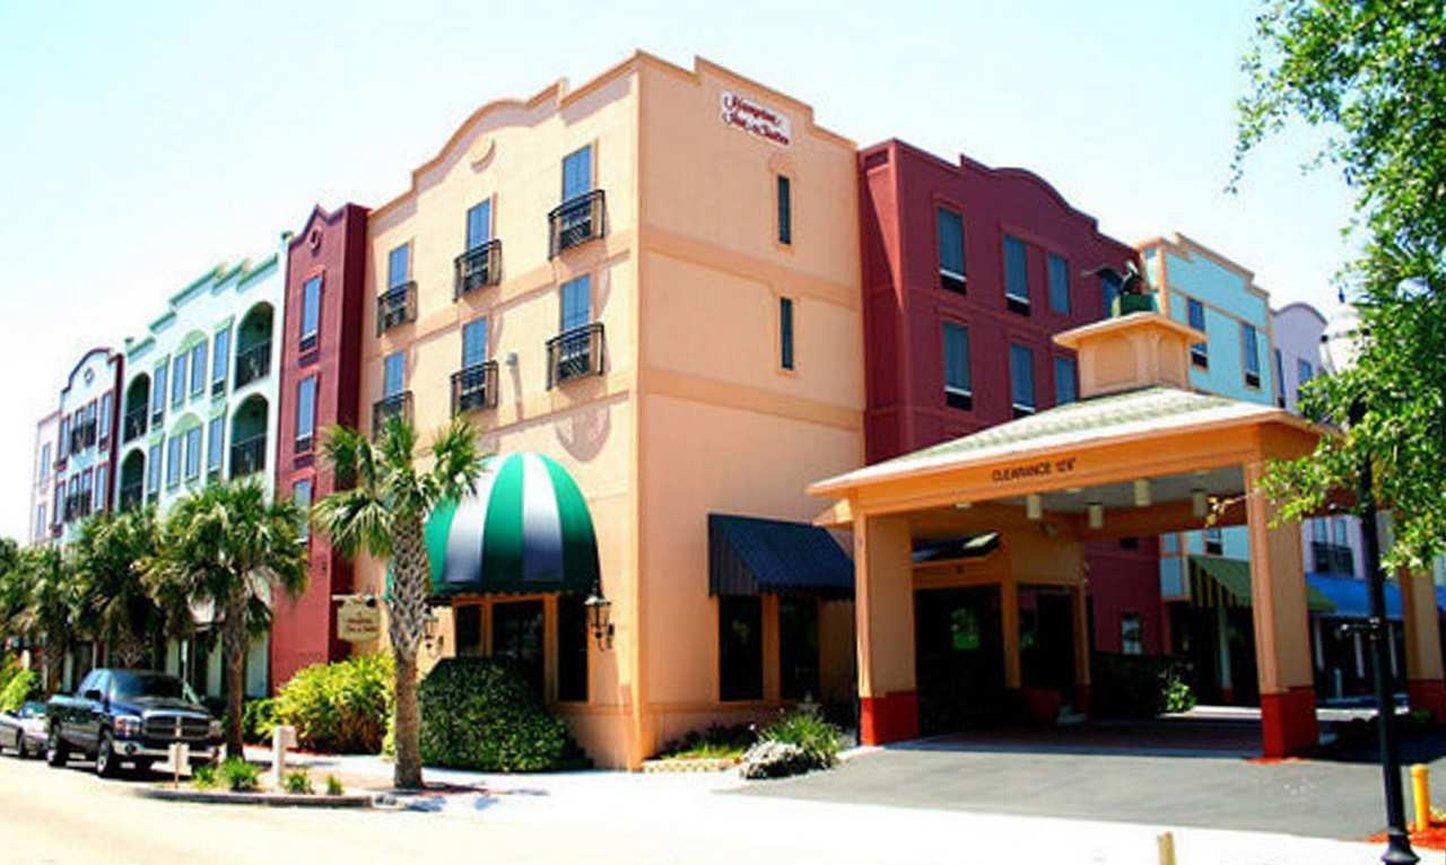 Hampton Inn & Suites Amelia Island-Historic Harbor Front